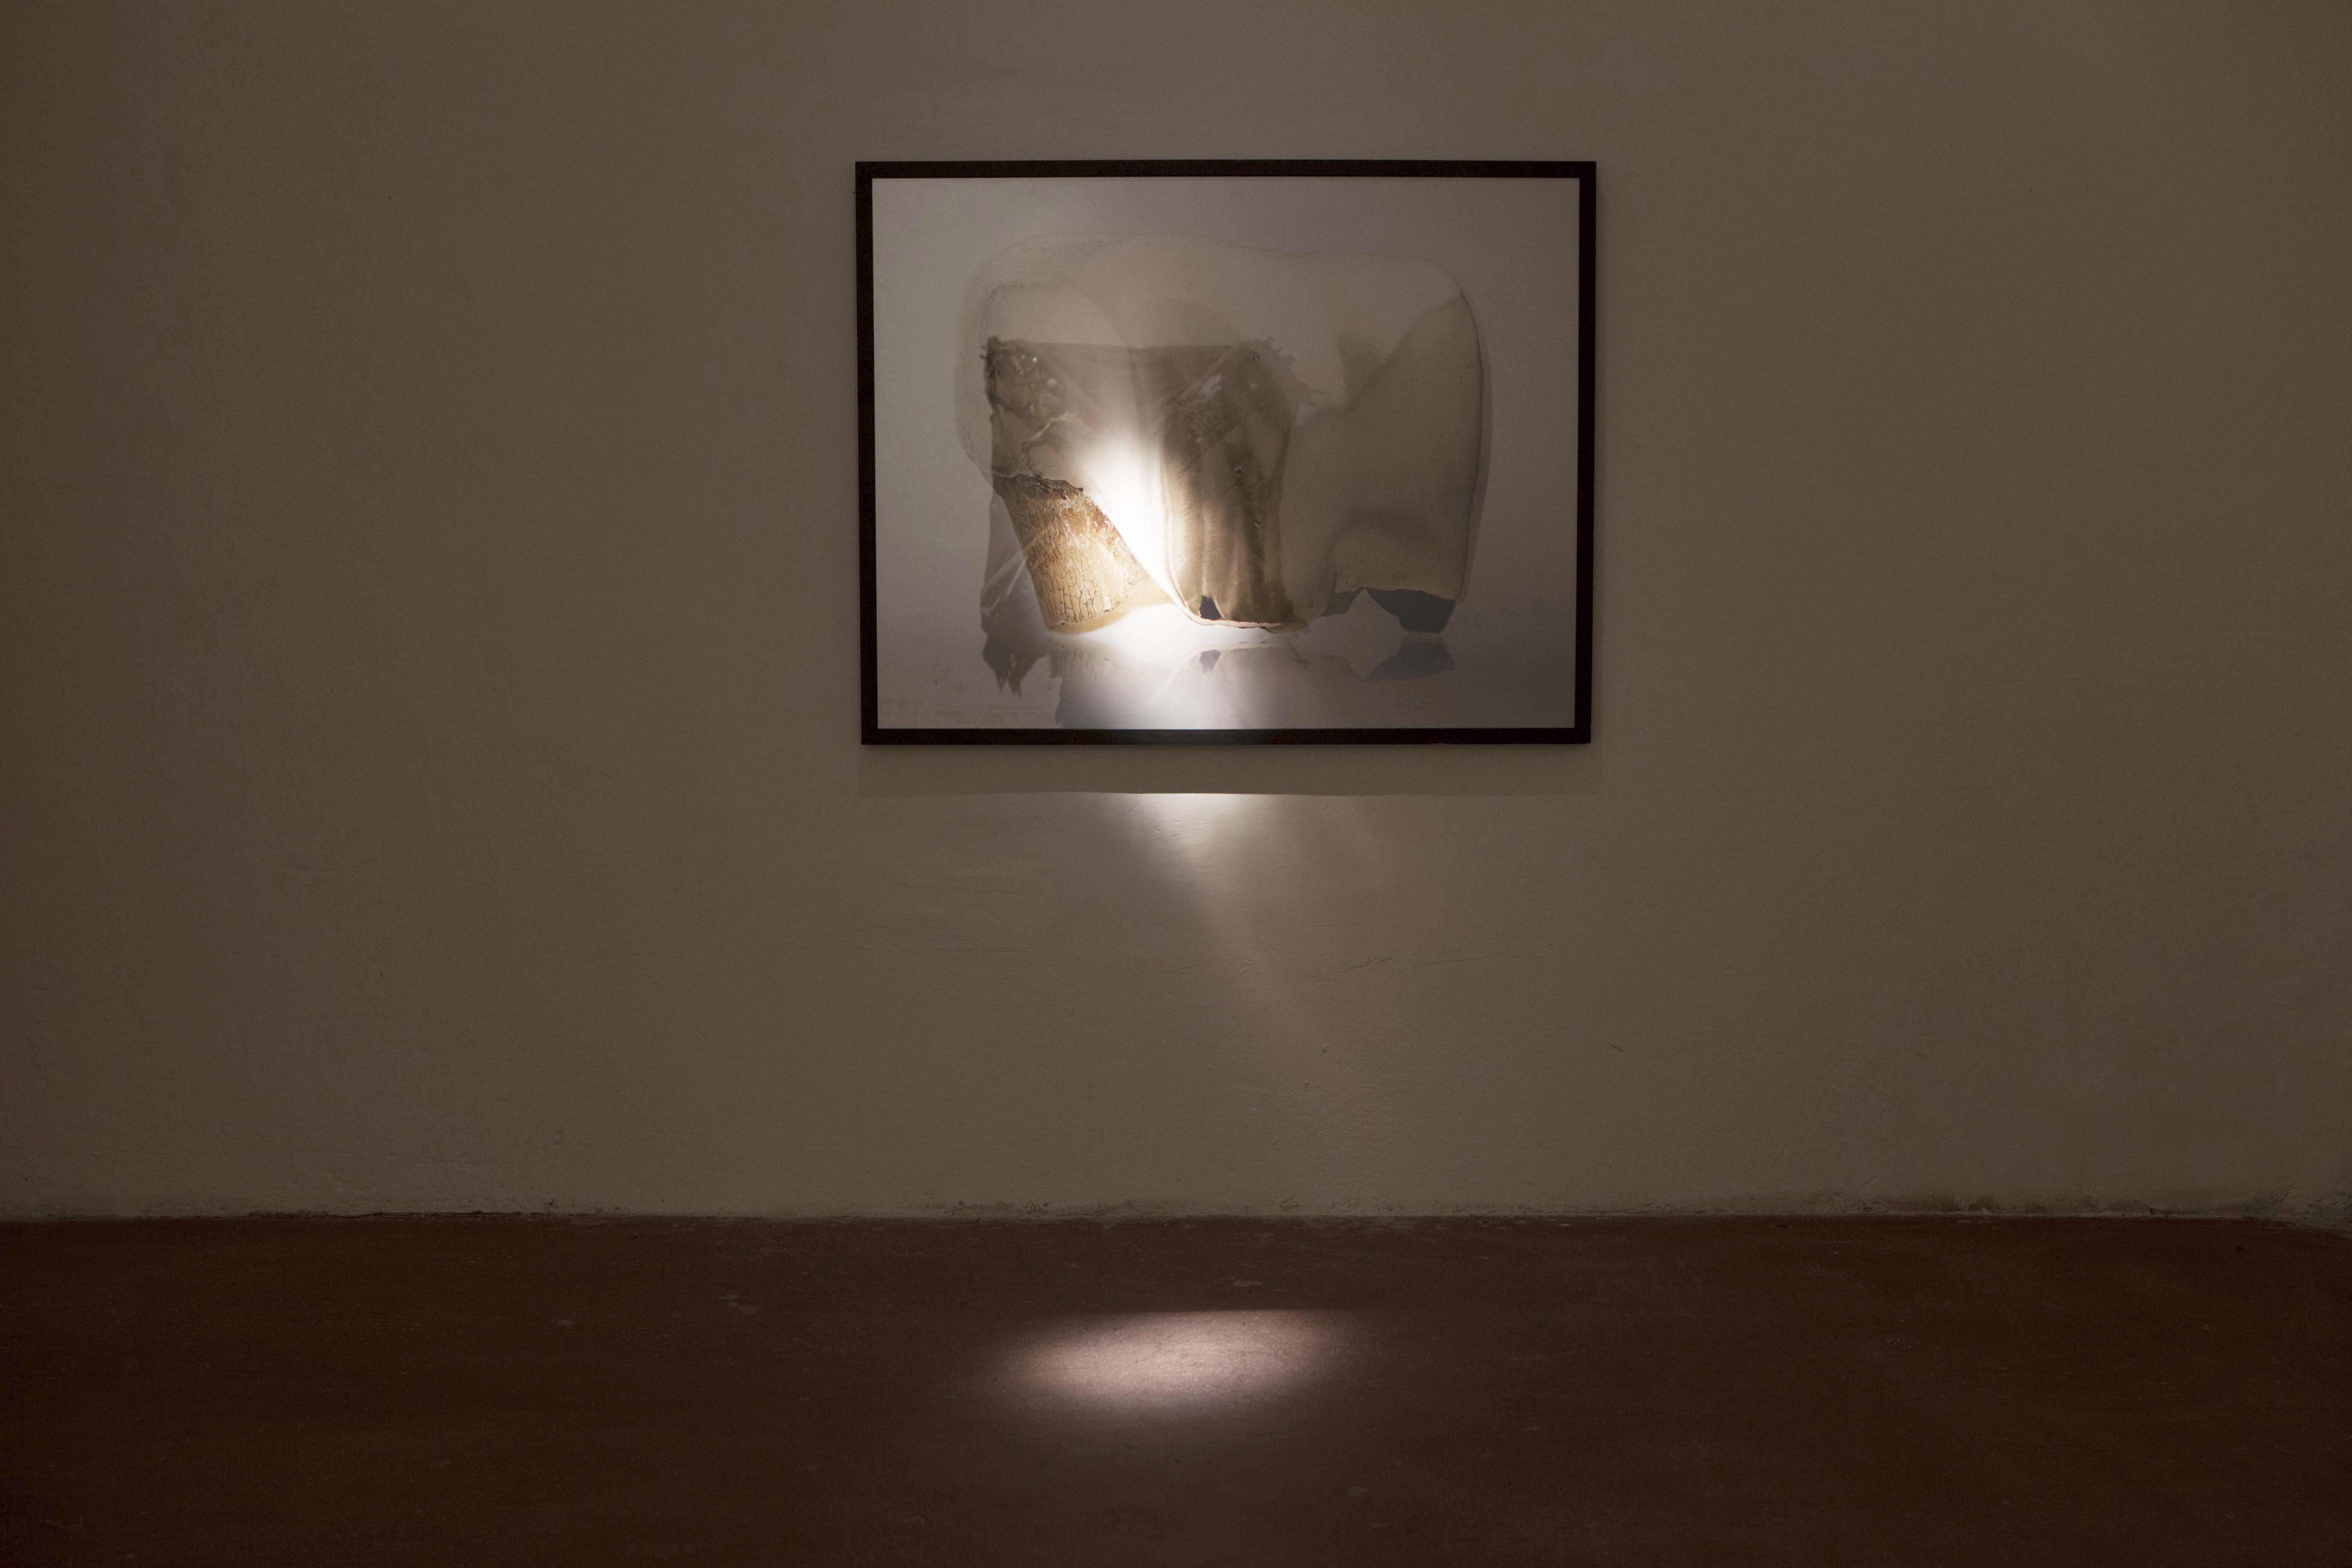 E. Axelrad, Is it safe, lambda dibond, 2012